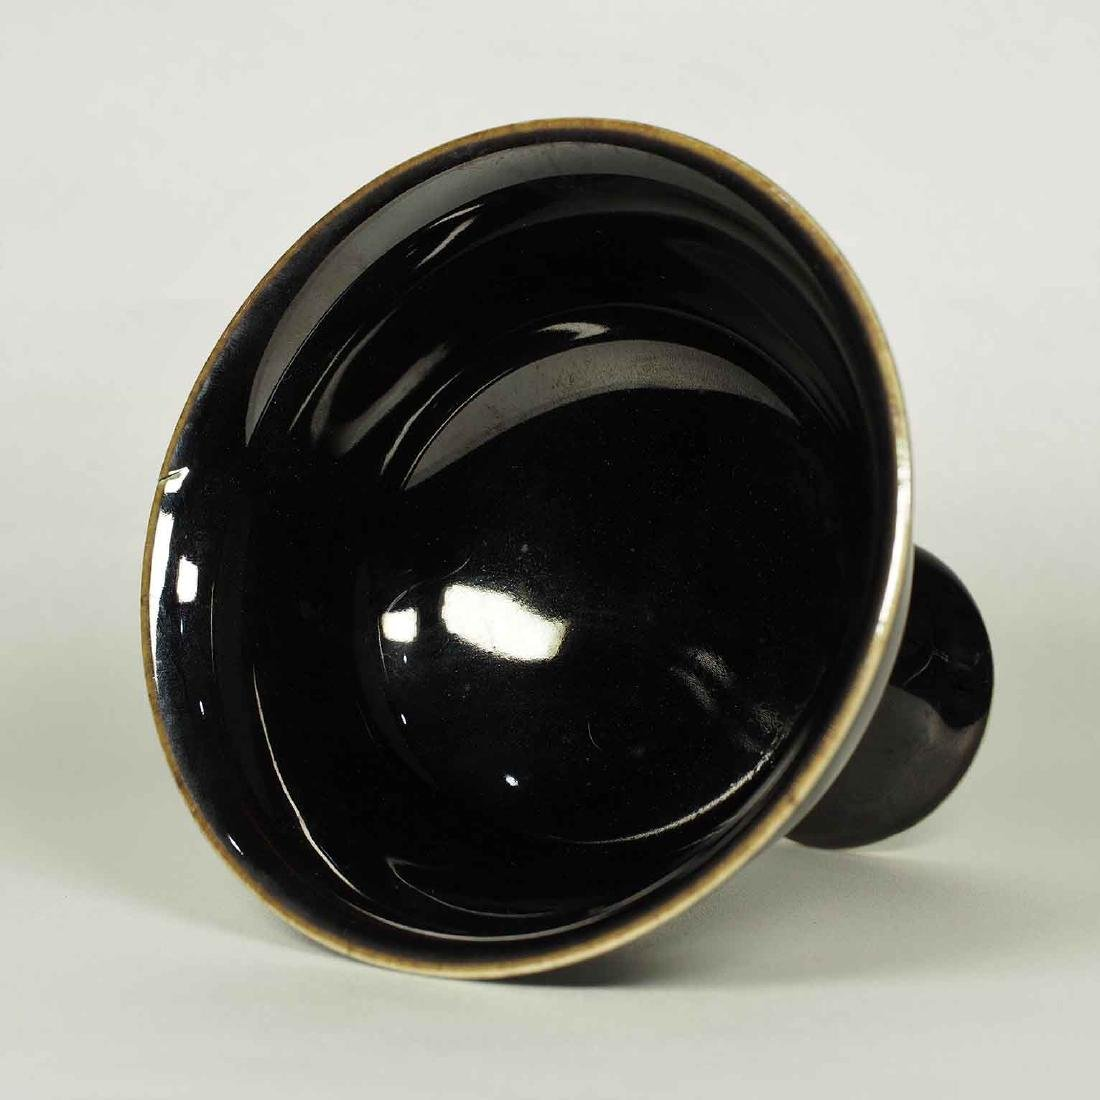 Black Glaze Stemcup, Kangxi Period Mark, Qing Dynasty - 3